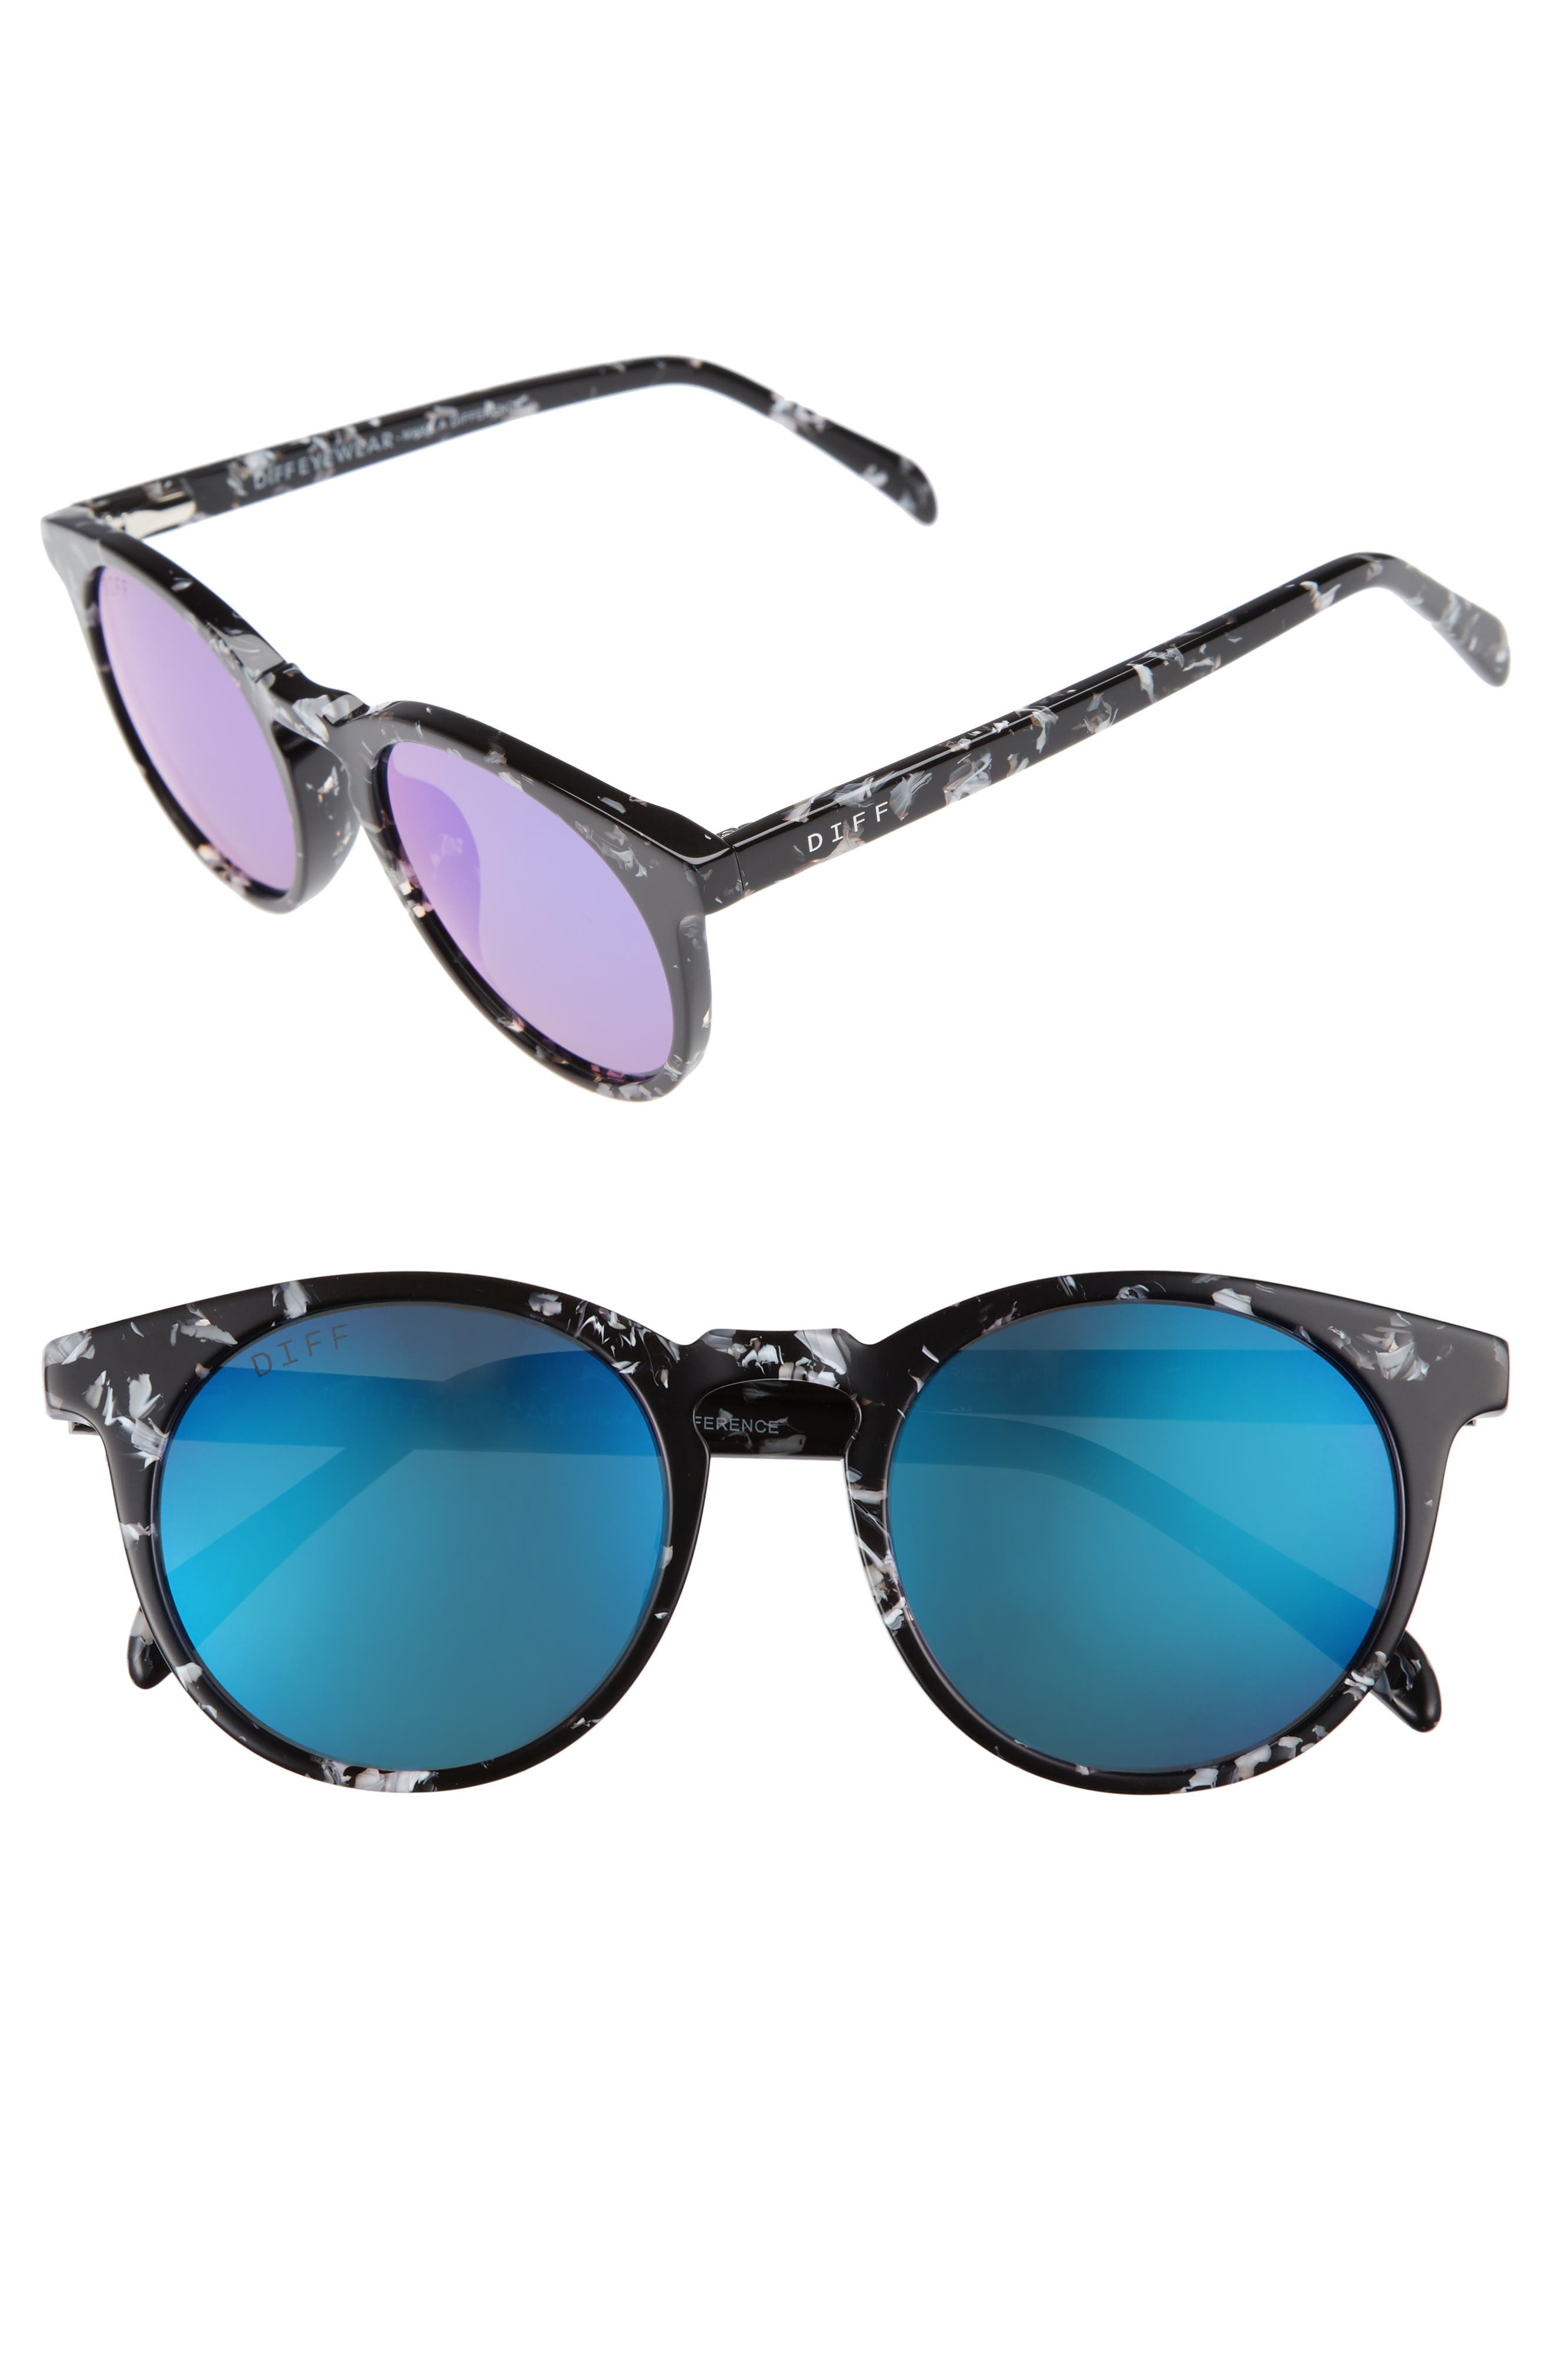 DIFF Charlie 48mm Mirrored Polarized Round Retro Sunglasses